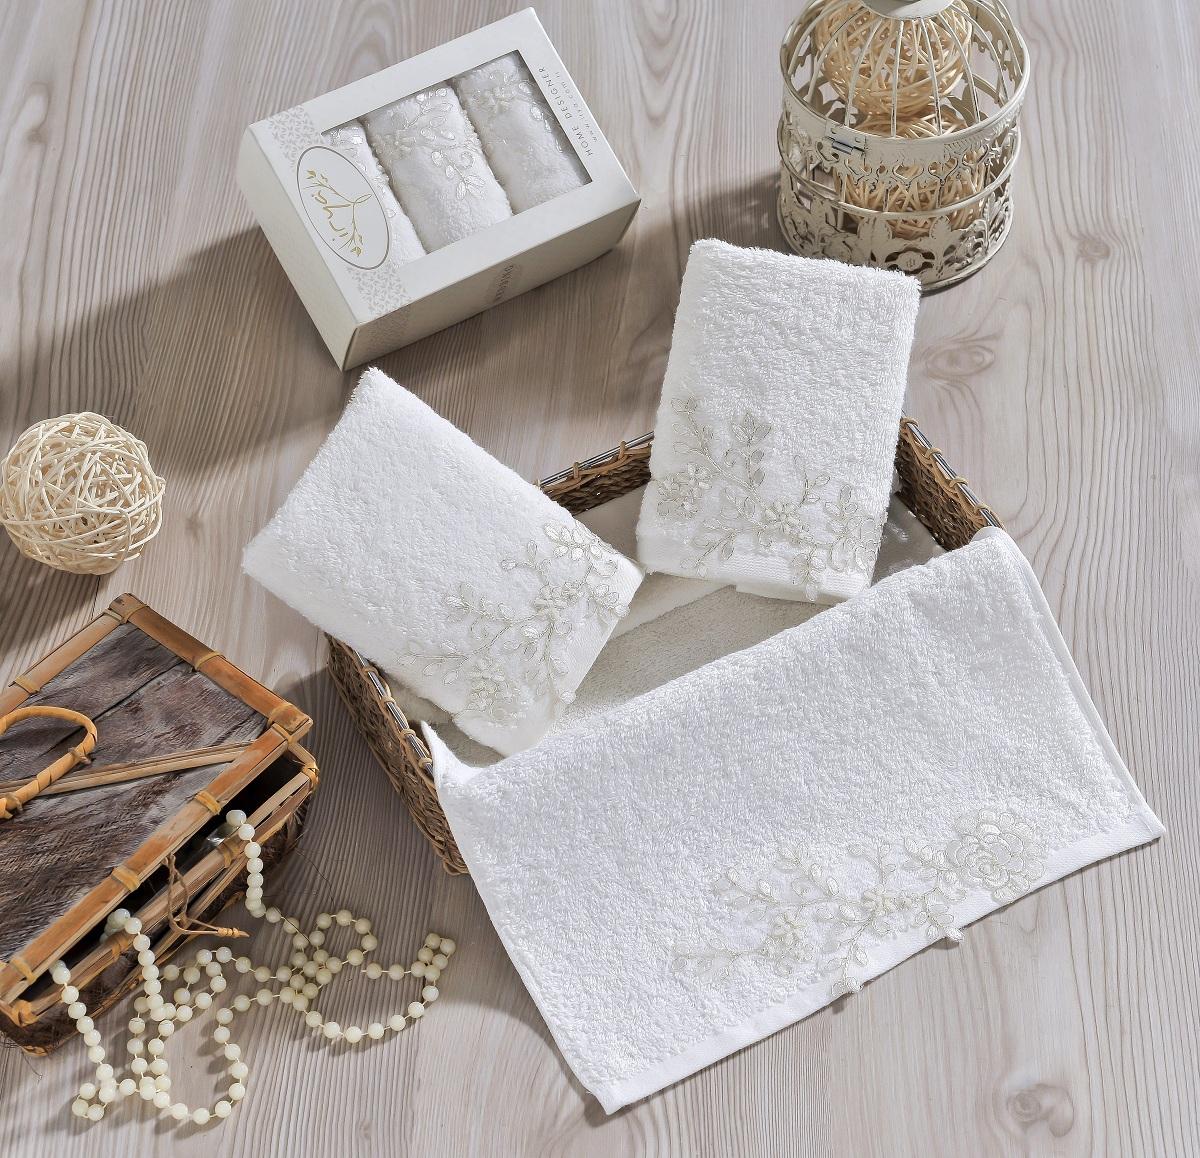 Купить Полотенца IRYA, Полотенце Sensitive Цвет: Молочный (30х50 см - 3 шт), Турция, Бежевый, Махра